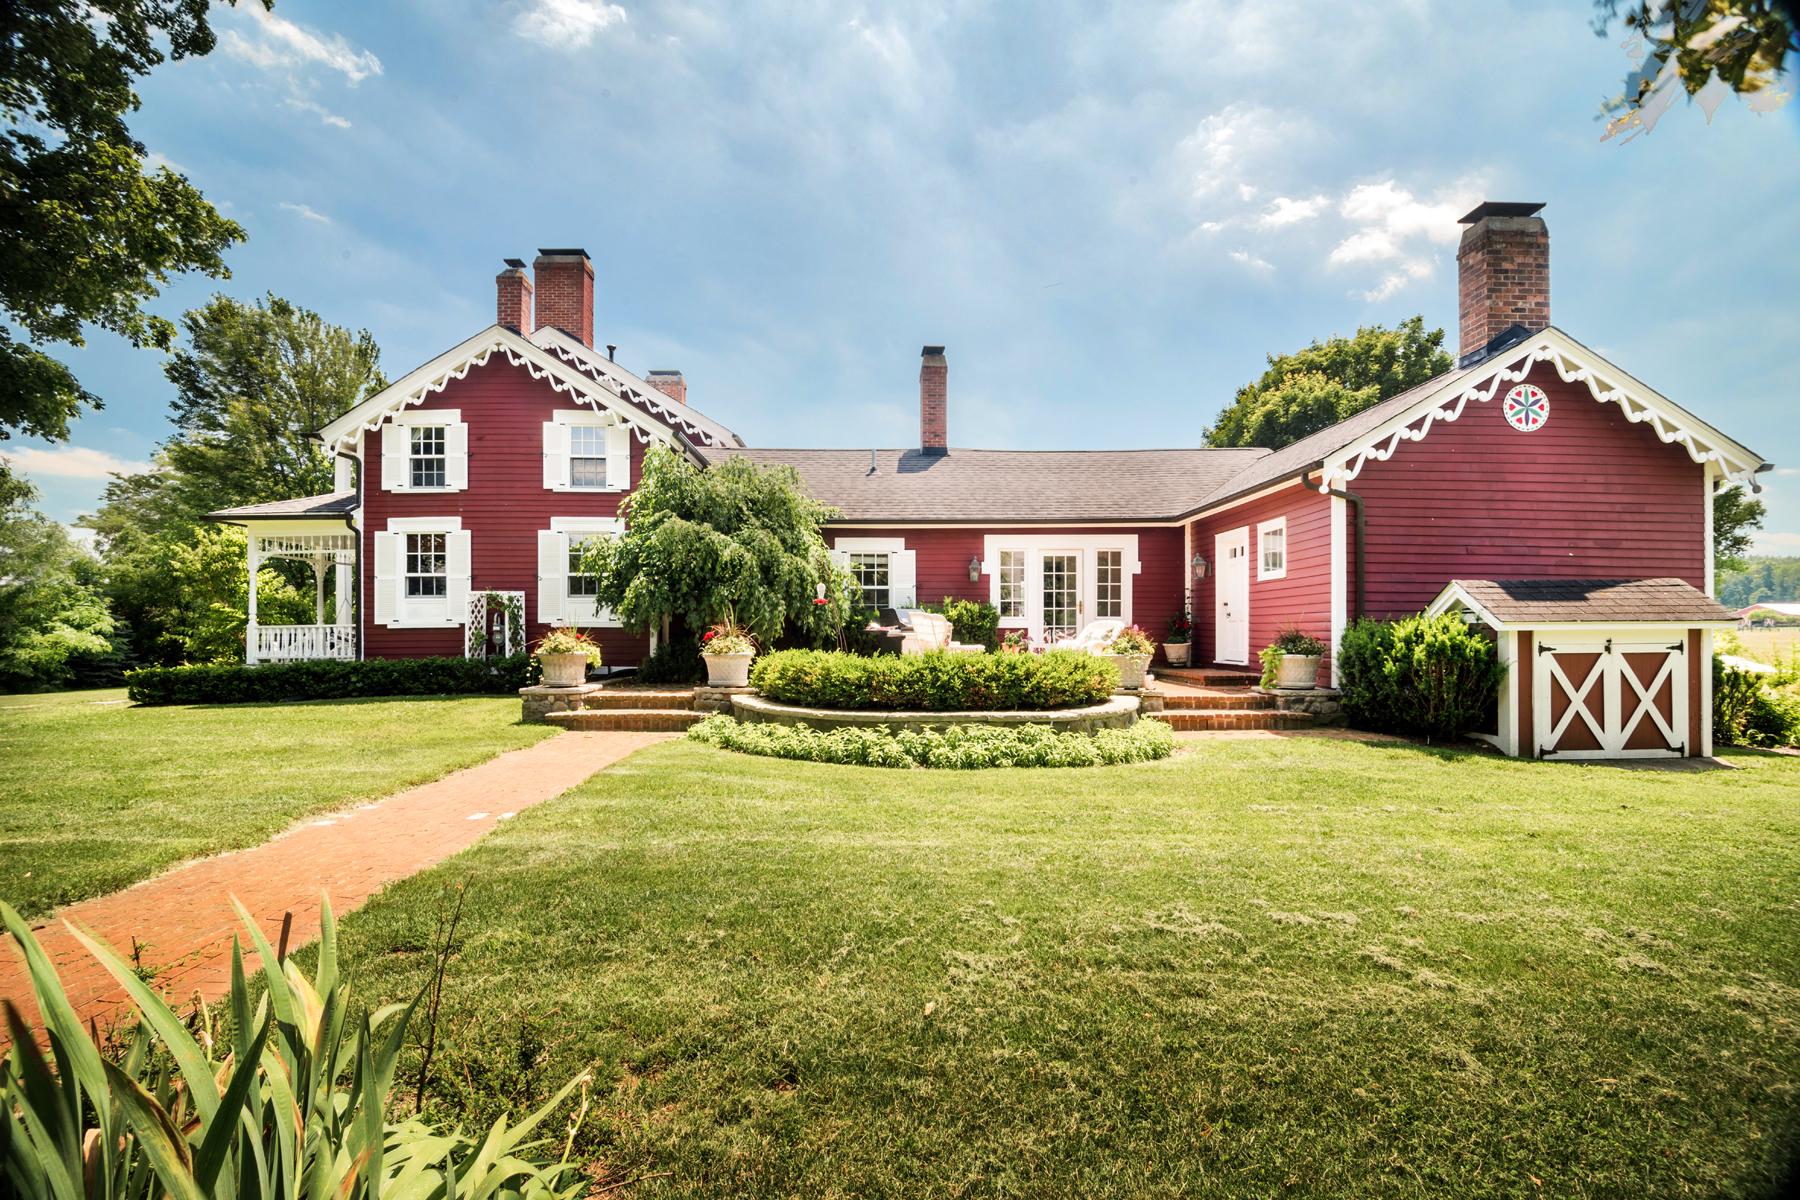 Single Family Homes for Sale at Metamora Township 5058 Barber Road Metamora, Michigan 48455 United States